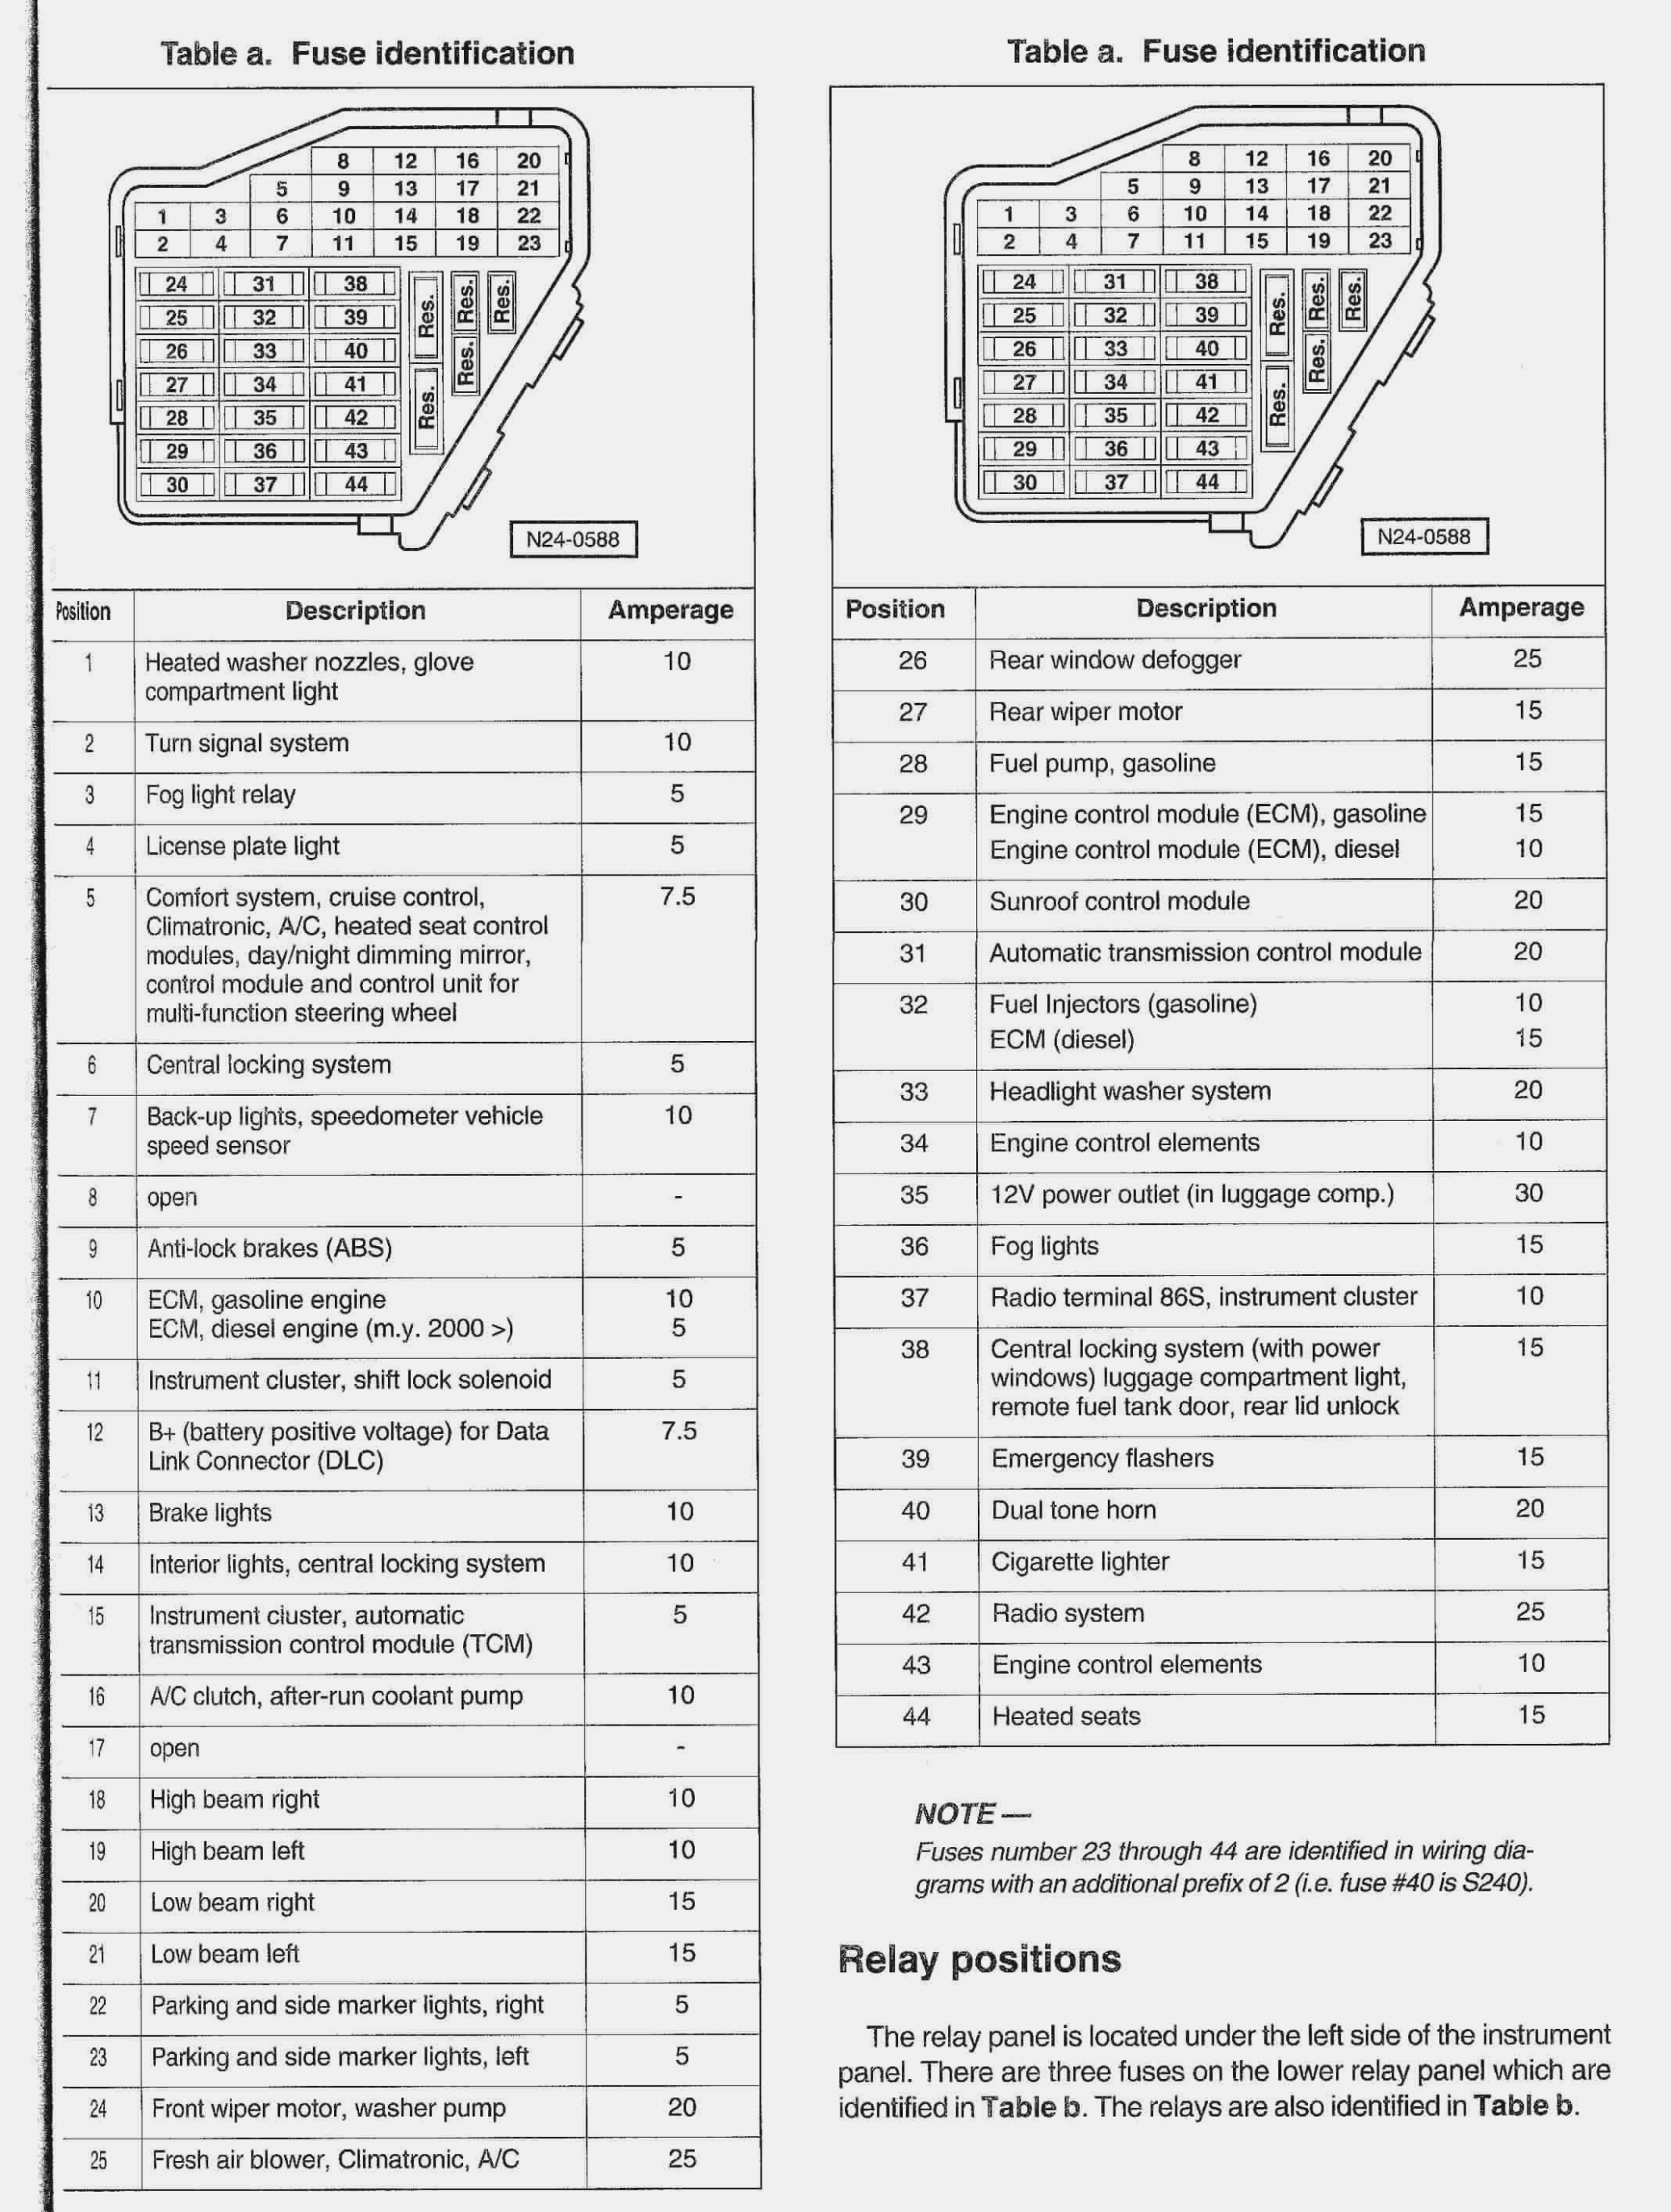 Unique Vw Golf Mk5 Headlight Wiring Diagram Diagram Diagramsample Diagramtemplate Wiringdiagram Diagramchart Worksheet Wor Jetta 2001 Jetta A4 Jetta Gli